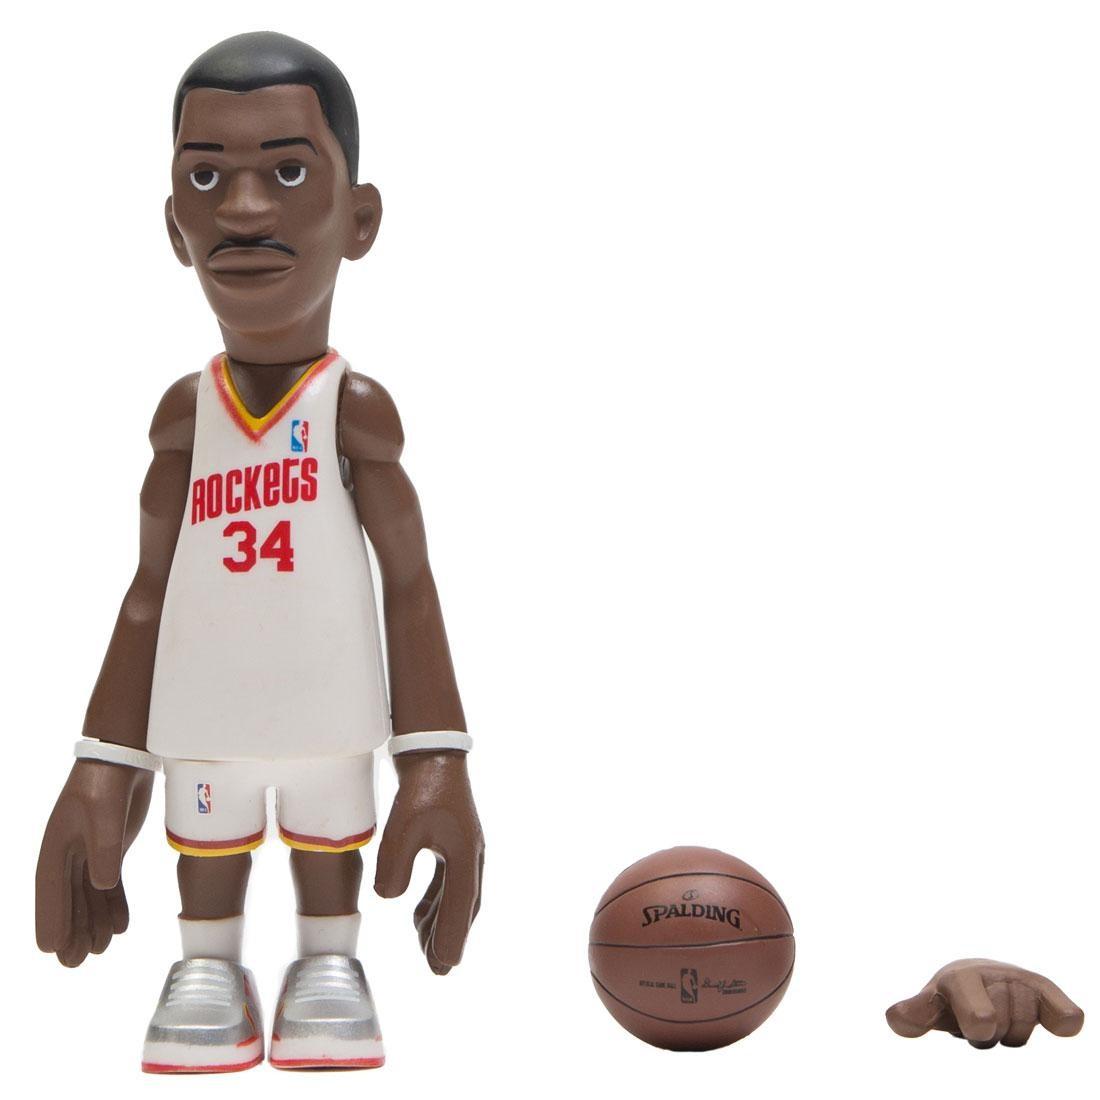 MINDstyle x Coolrain NBA Legends Houston Rockets Hakeem Olajuwon Figure (white)